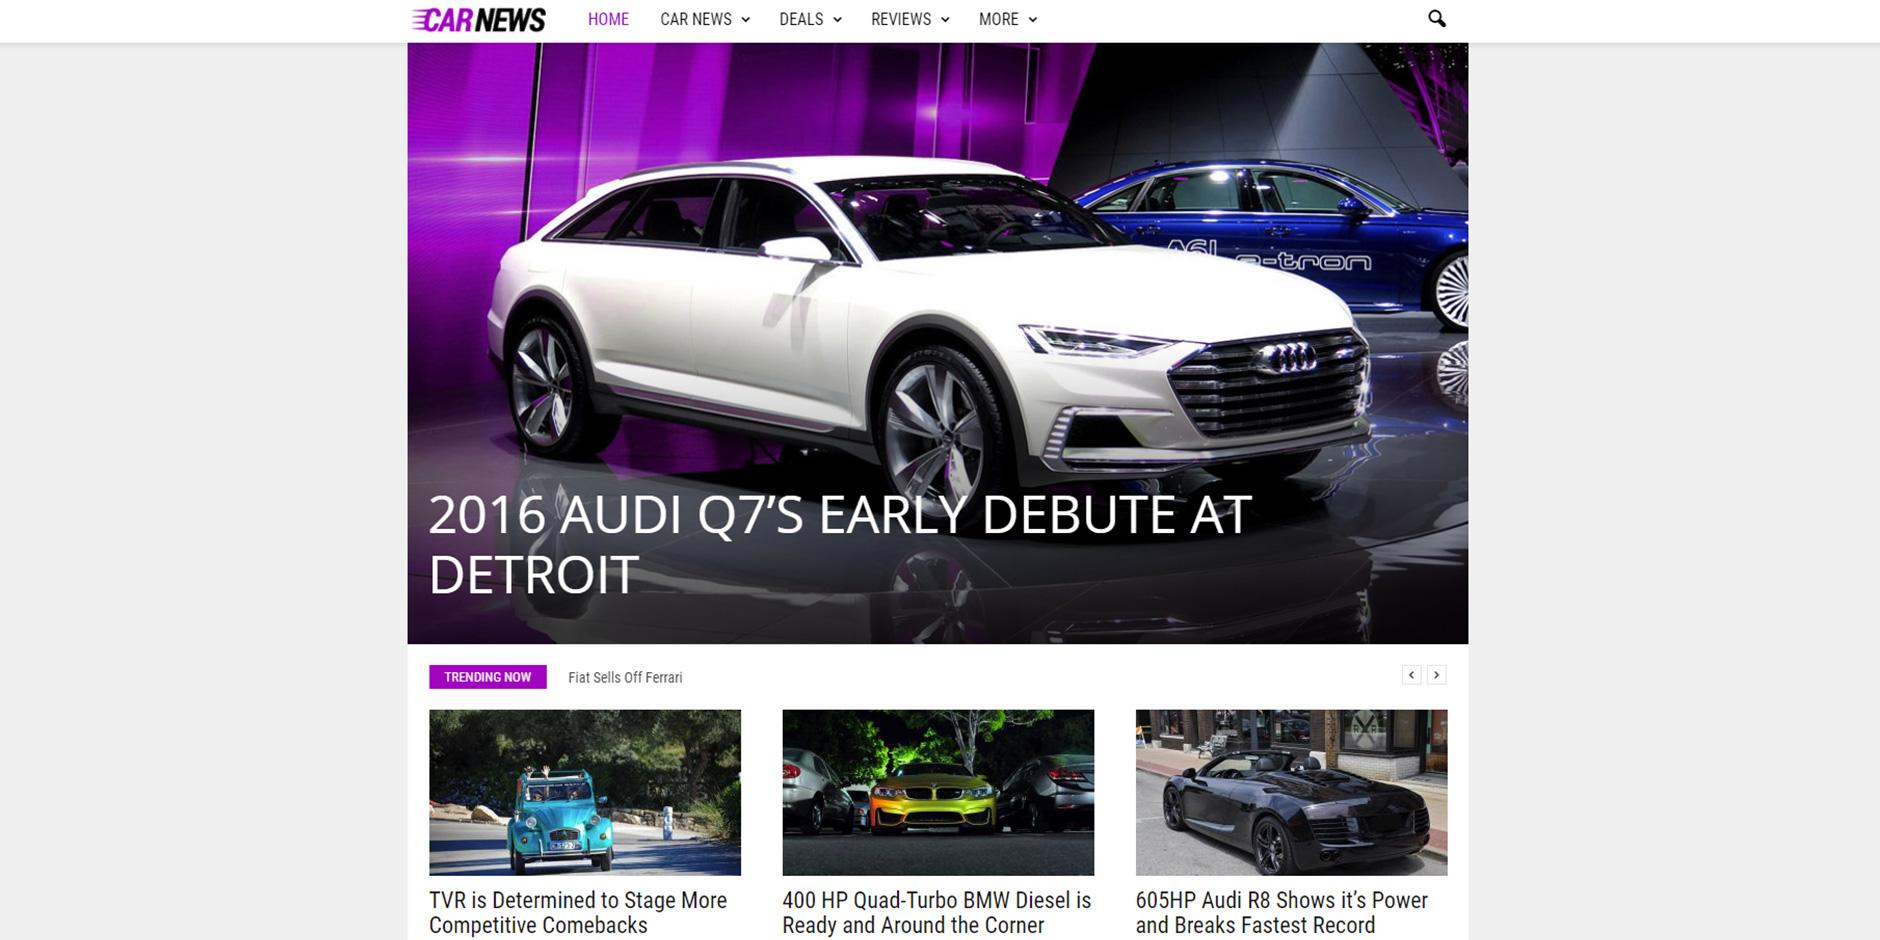 Newsmag_Car_News_Demo